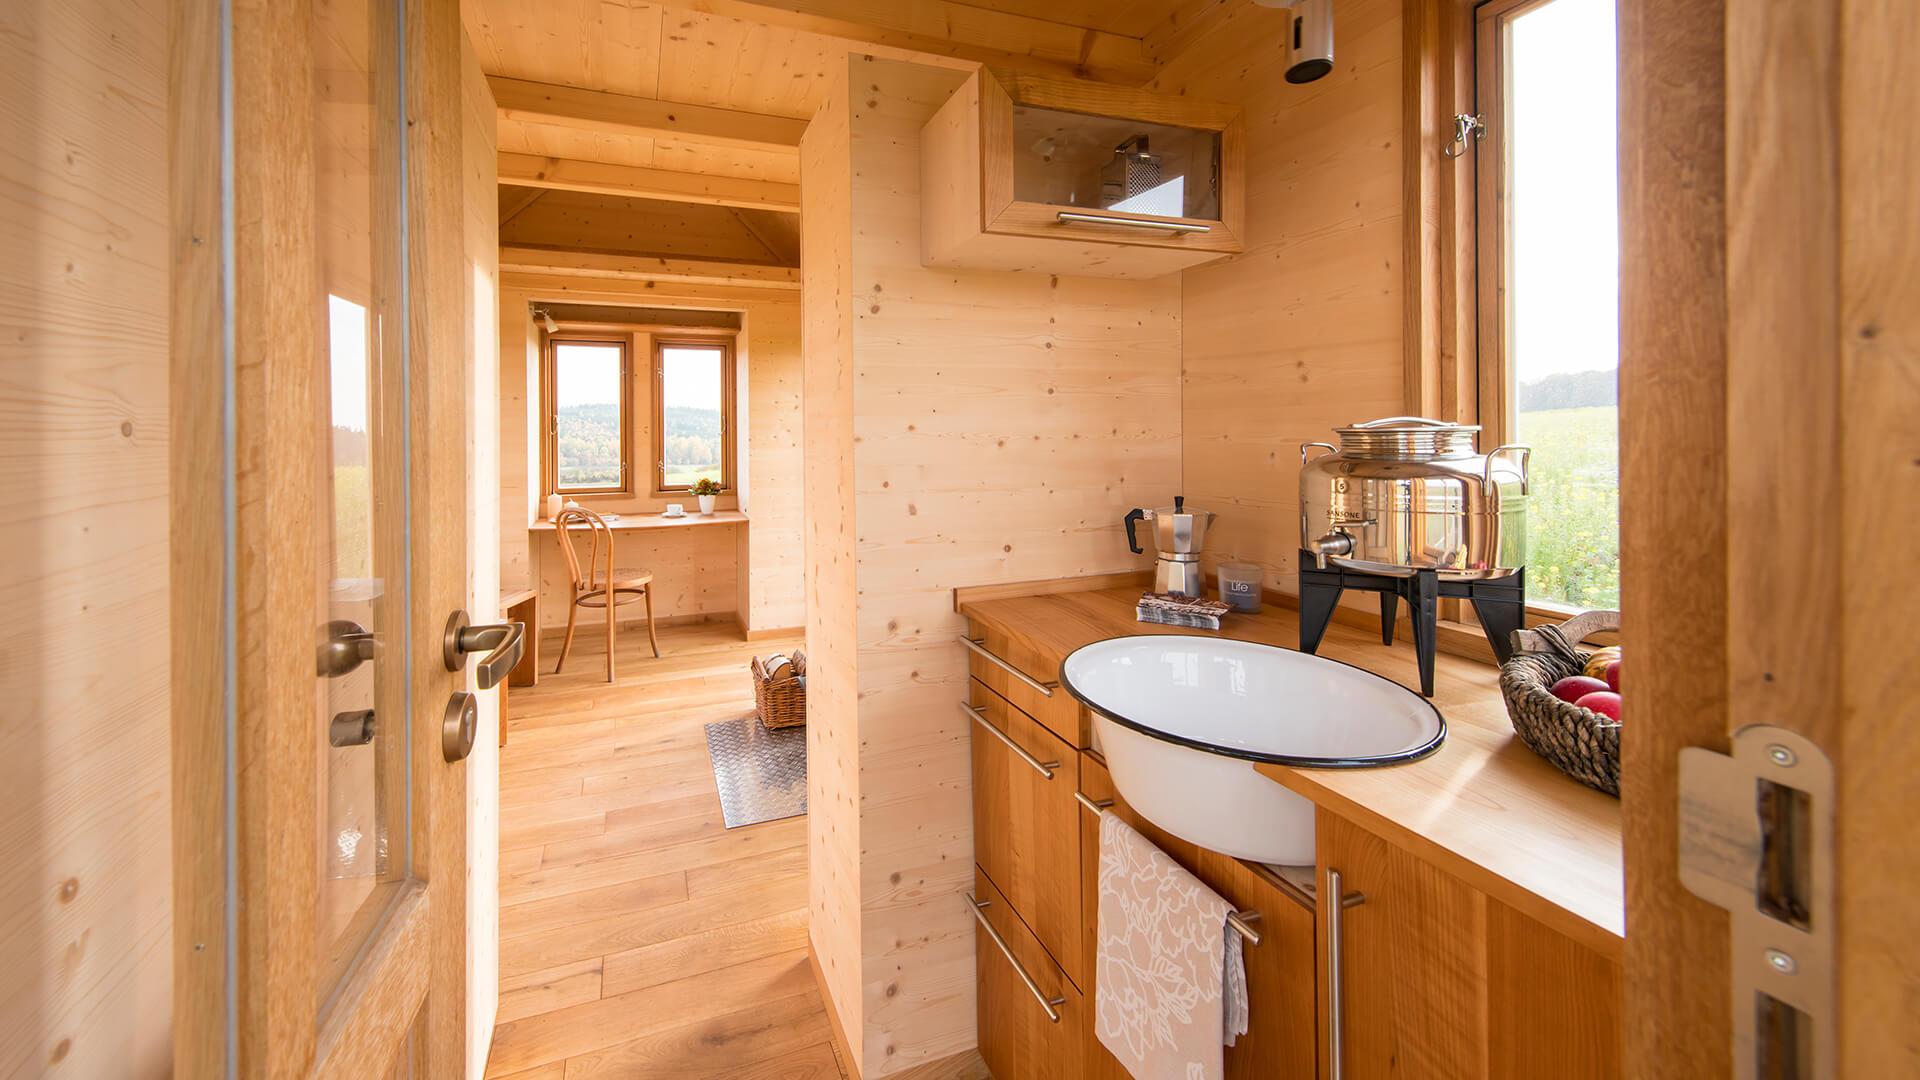 startseite tiny house. Black Bedroom Furniture Sets. Home Design Ideas